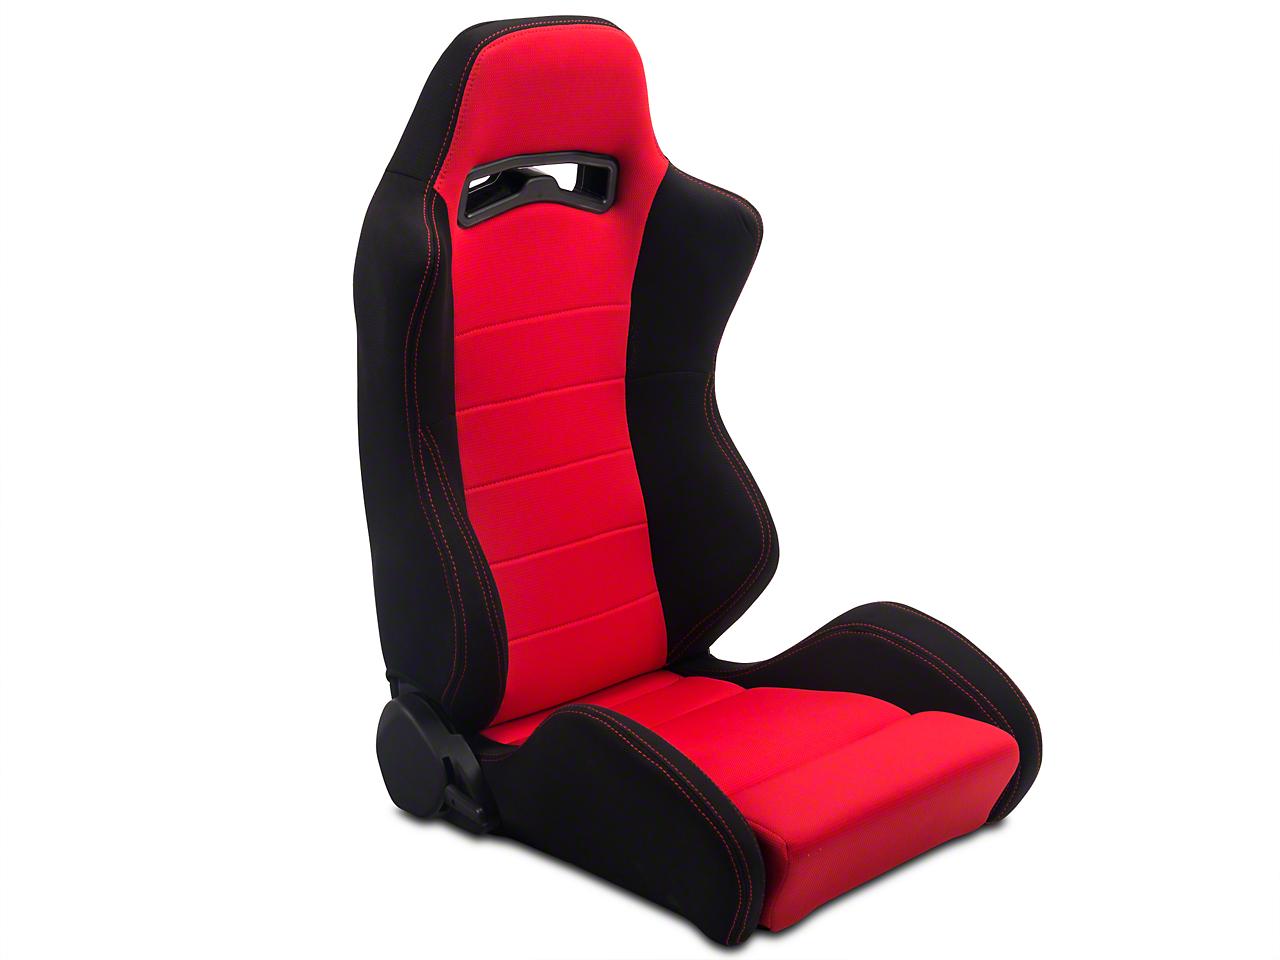 SpeedForm Black & Red Racing Seats - Pair (79-14 All)